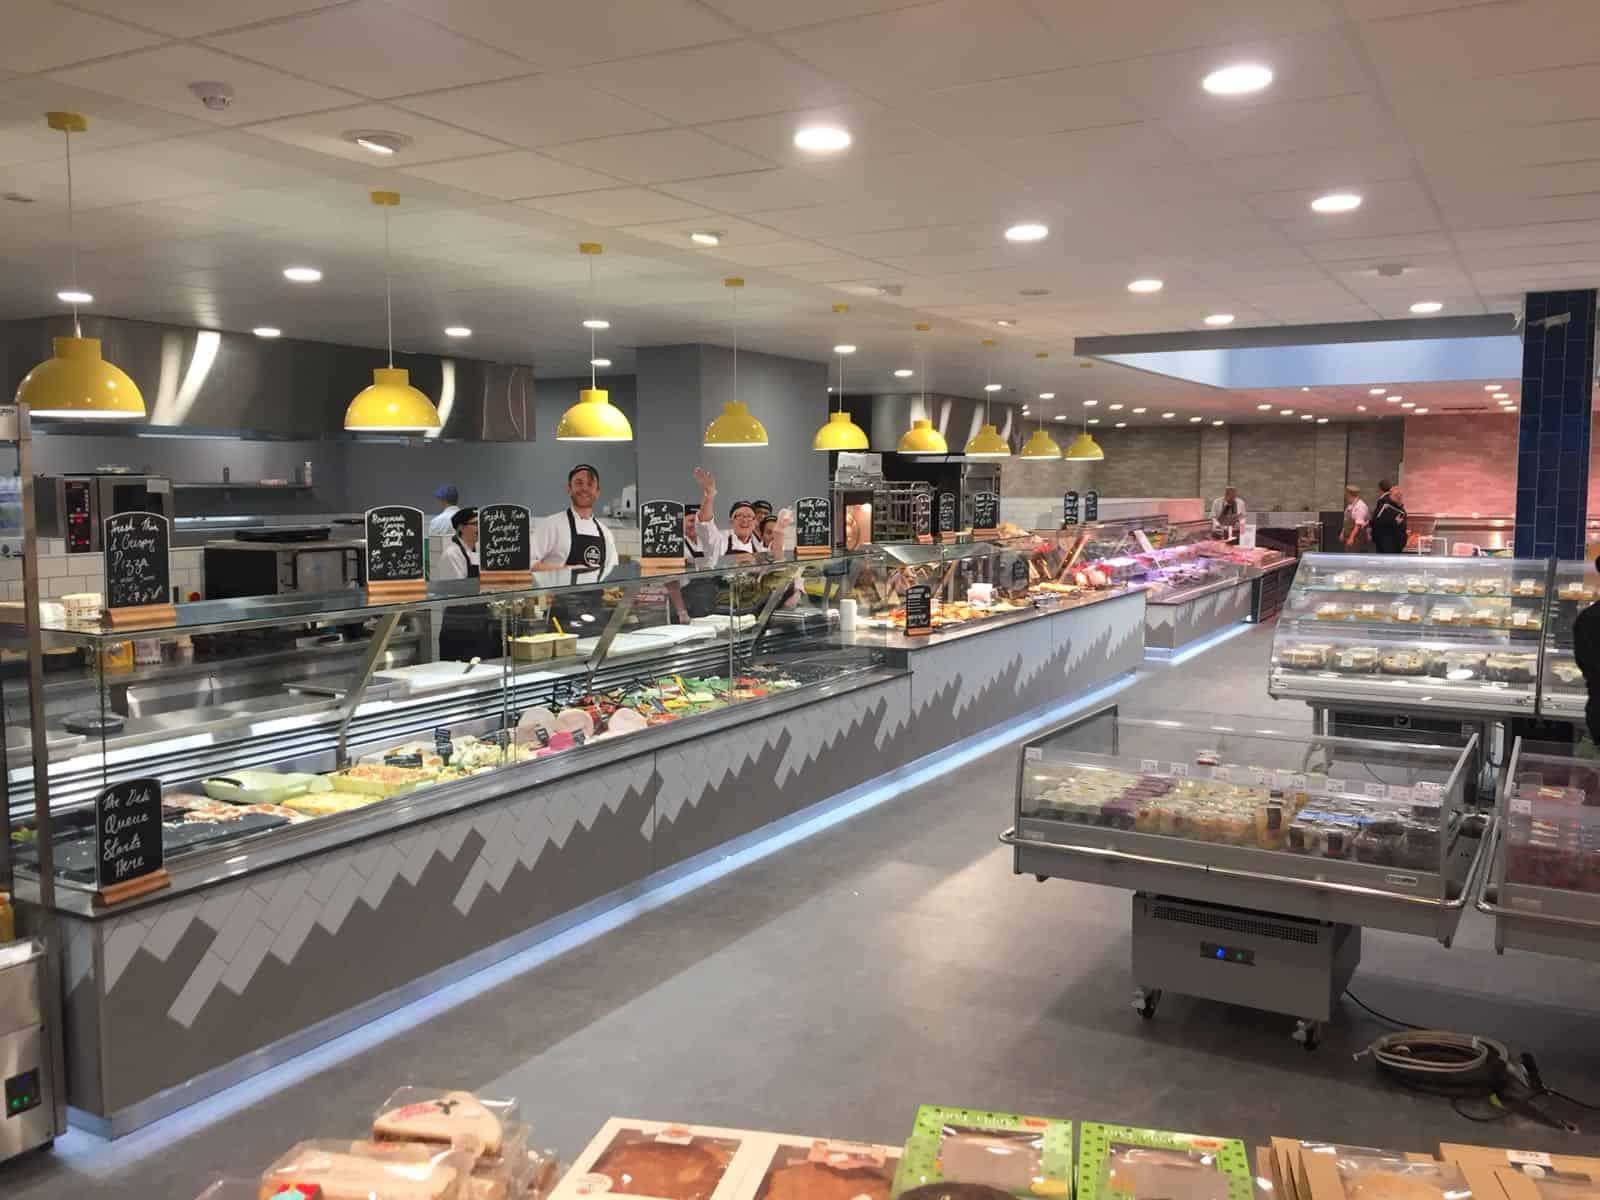 Martin Food Equipment Deli-Area-at-McHughs-Centra-Greendale-Kilbarrack McHugh's Centra, Greendale, Kilbarrack, Dublin Installations